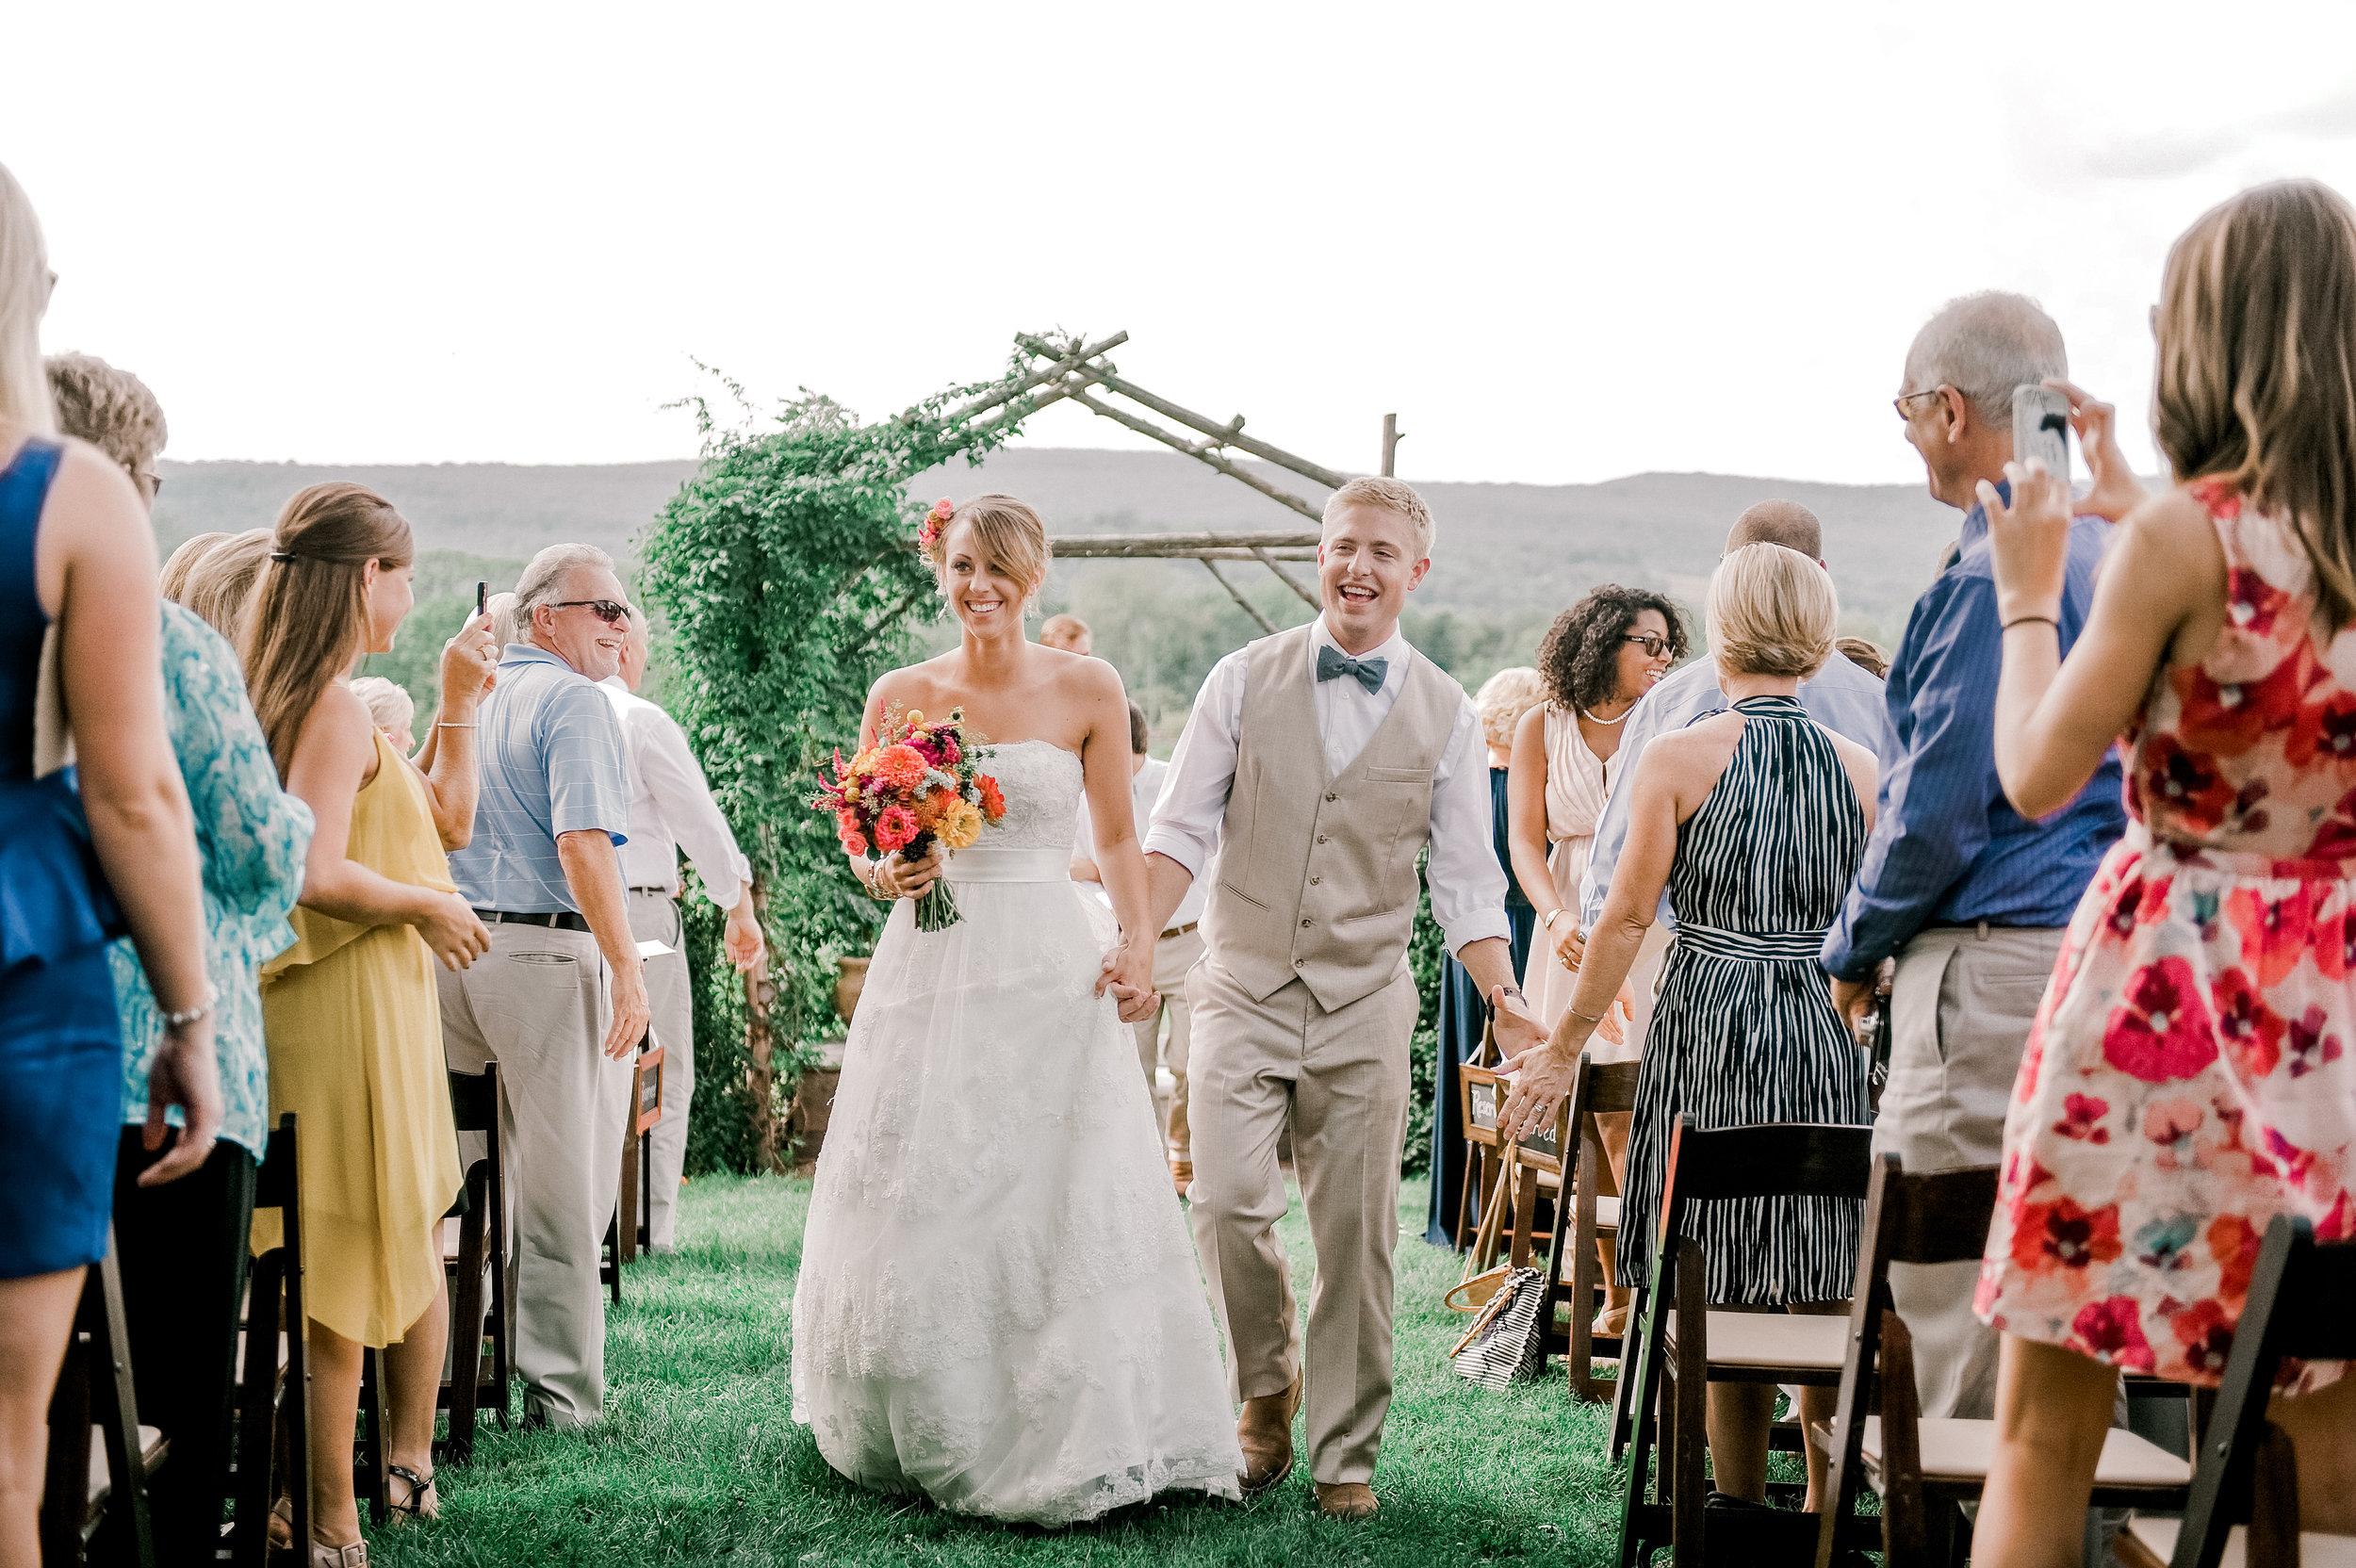 Silverbrook-Farm-Weddings-Virginia-17.jpg